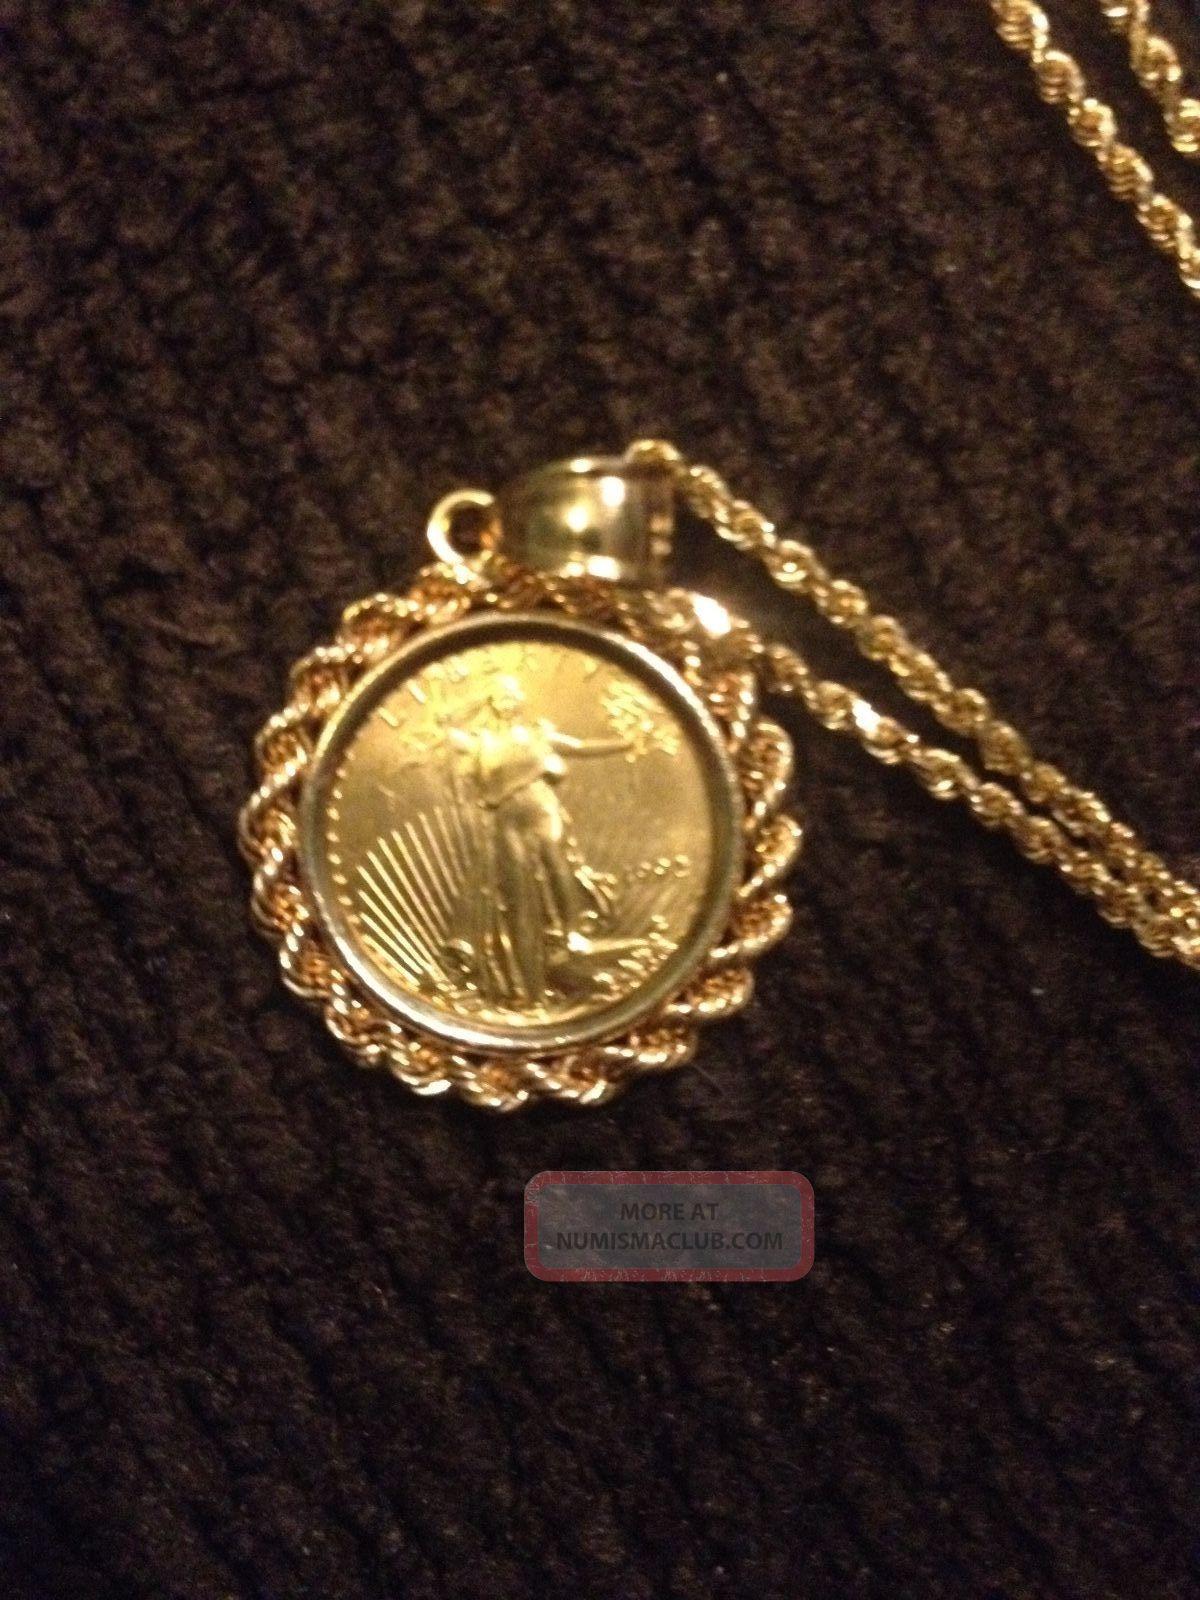 14k Yellow Gold Chain Necklace W Unique 1992 1 10th Oz 5 U S Gold Coin